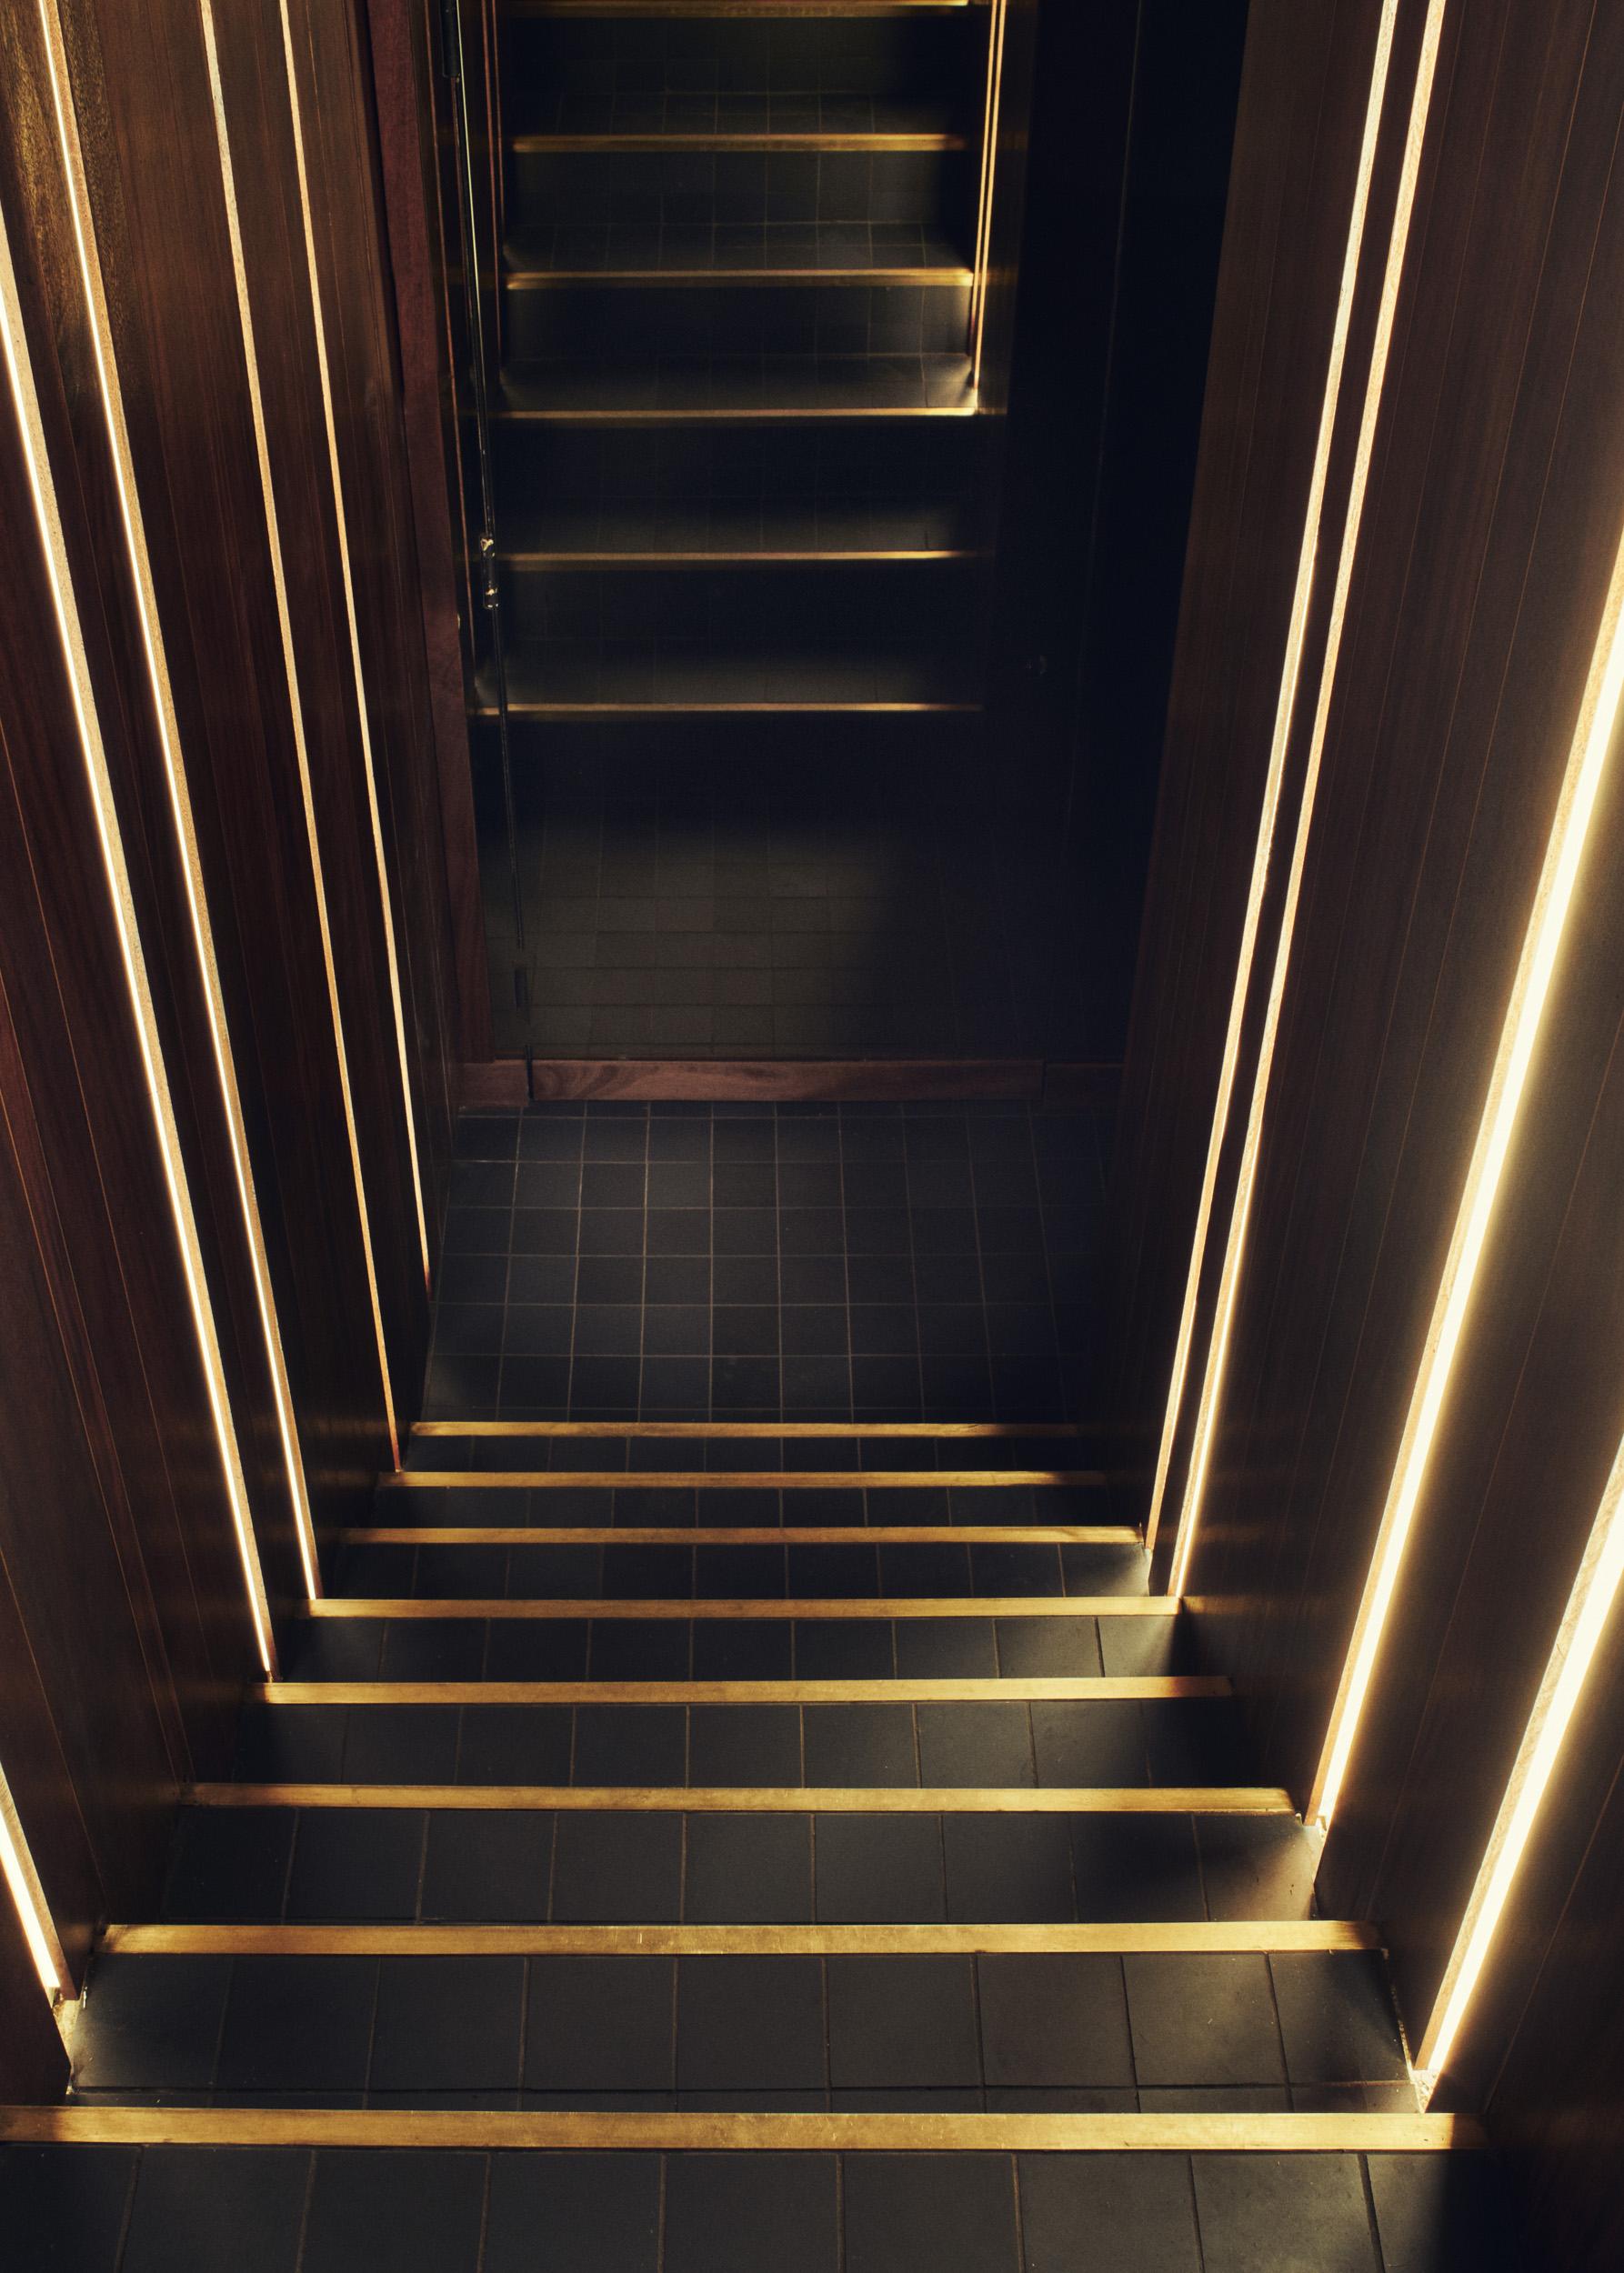 sugar-east-secret-bar-staircase-0783-portrait-2.jpg